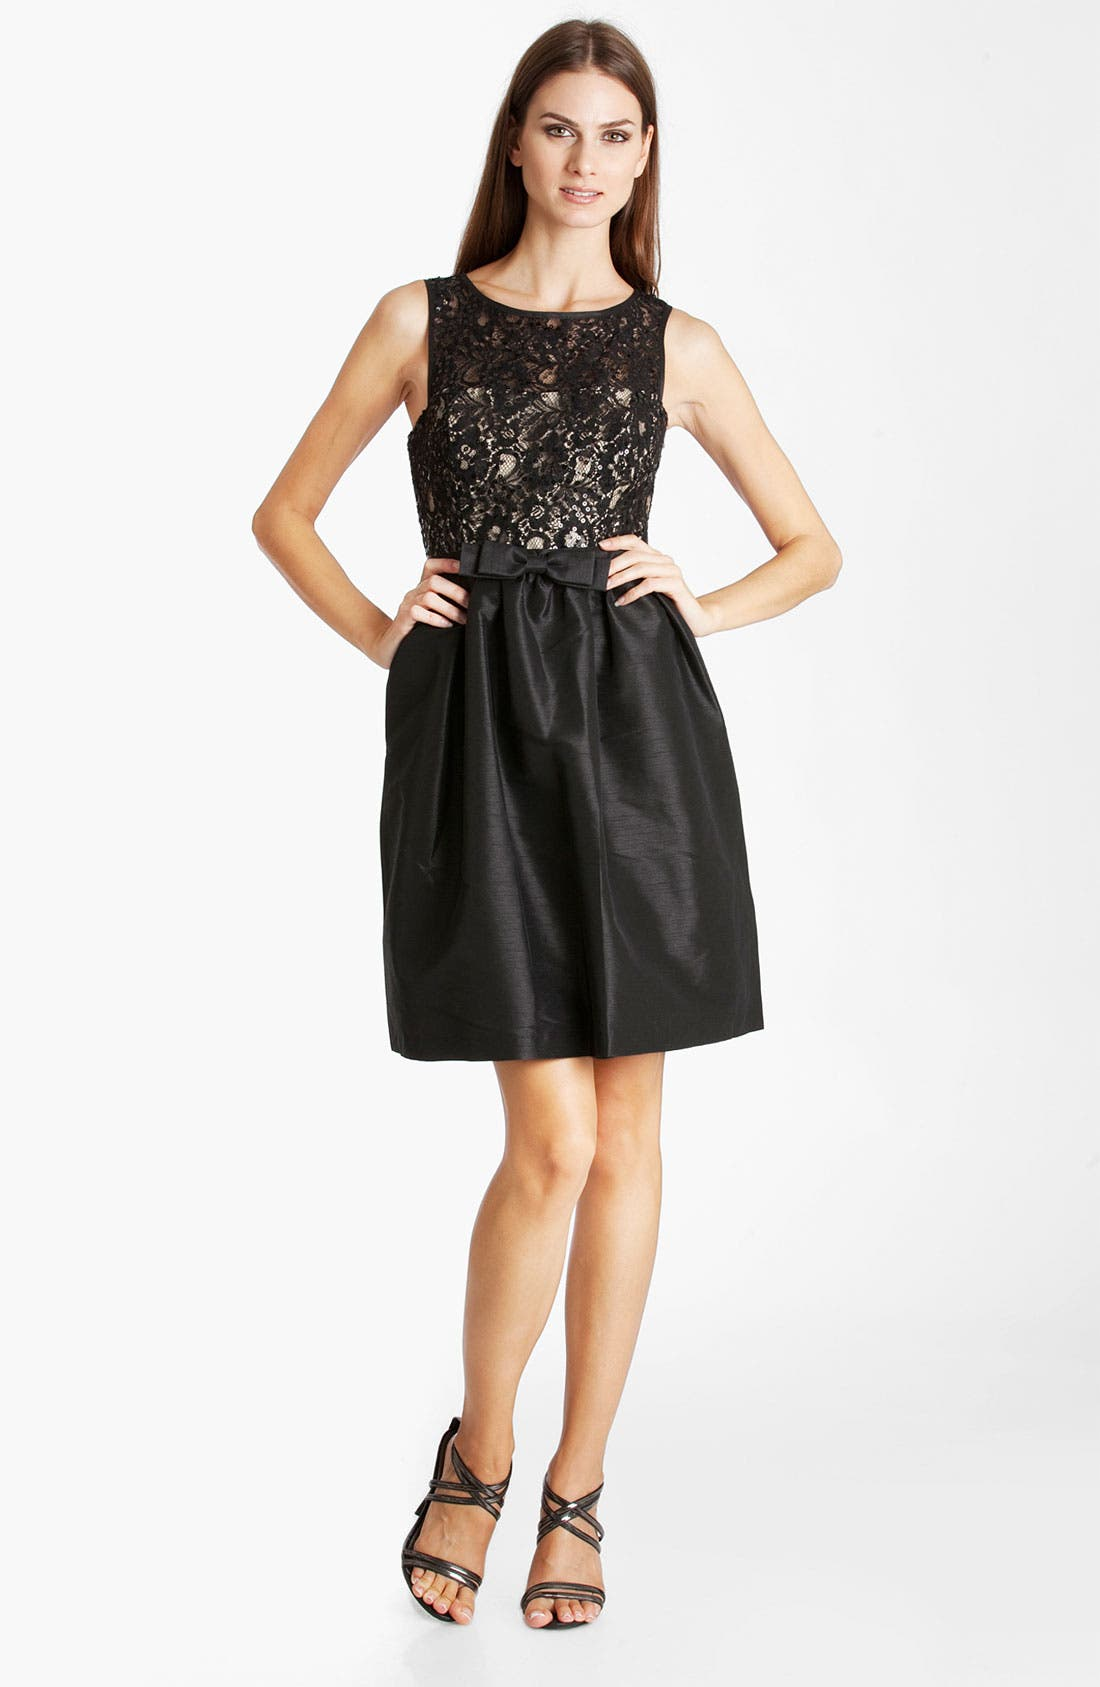 Alternate Image 1 Selected - JS Boutique Beaded Fit & Flare Dress